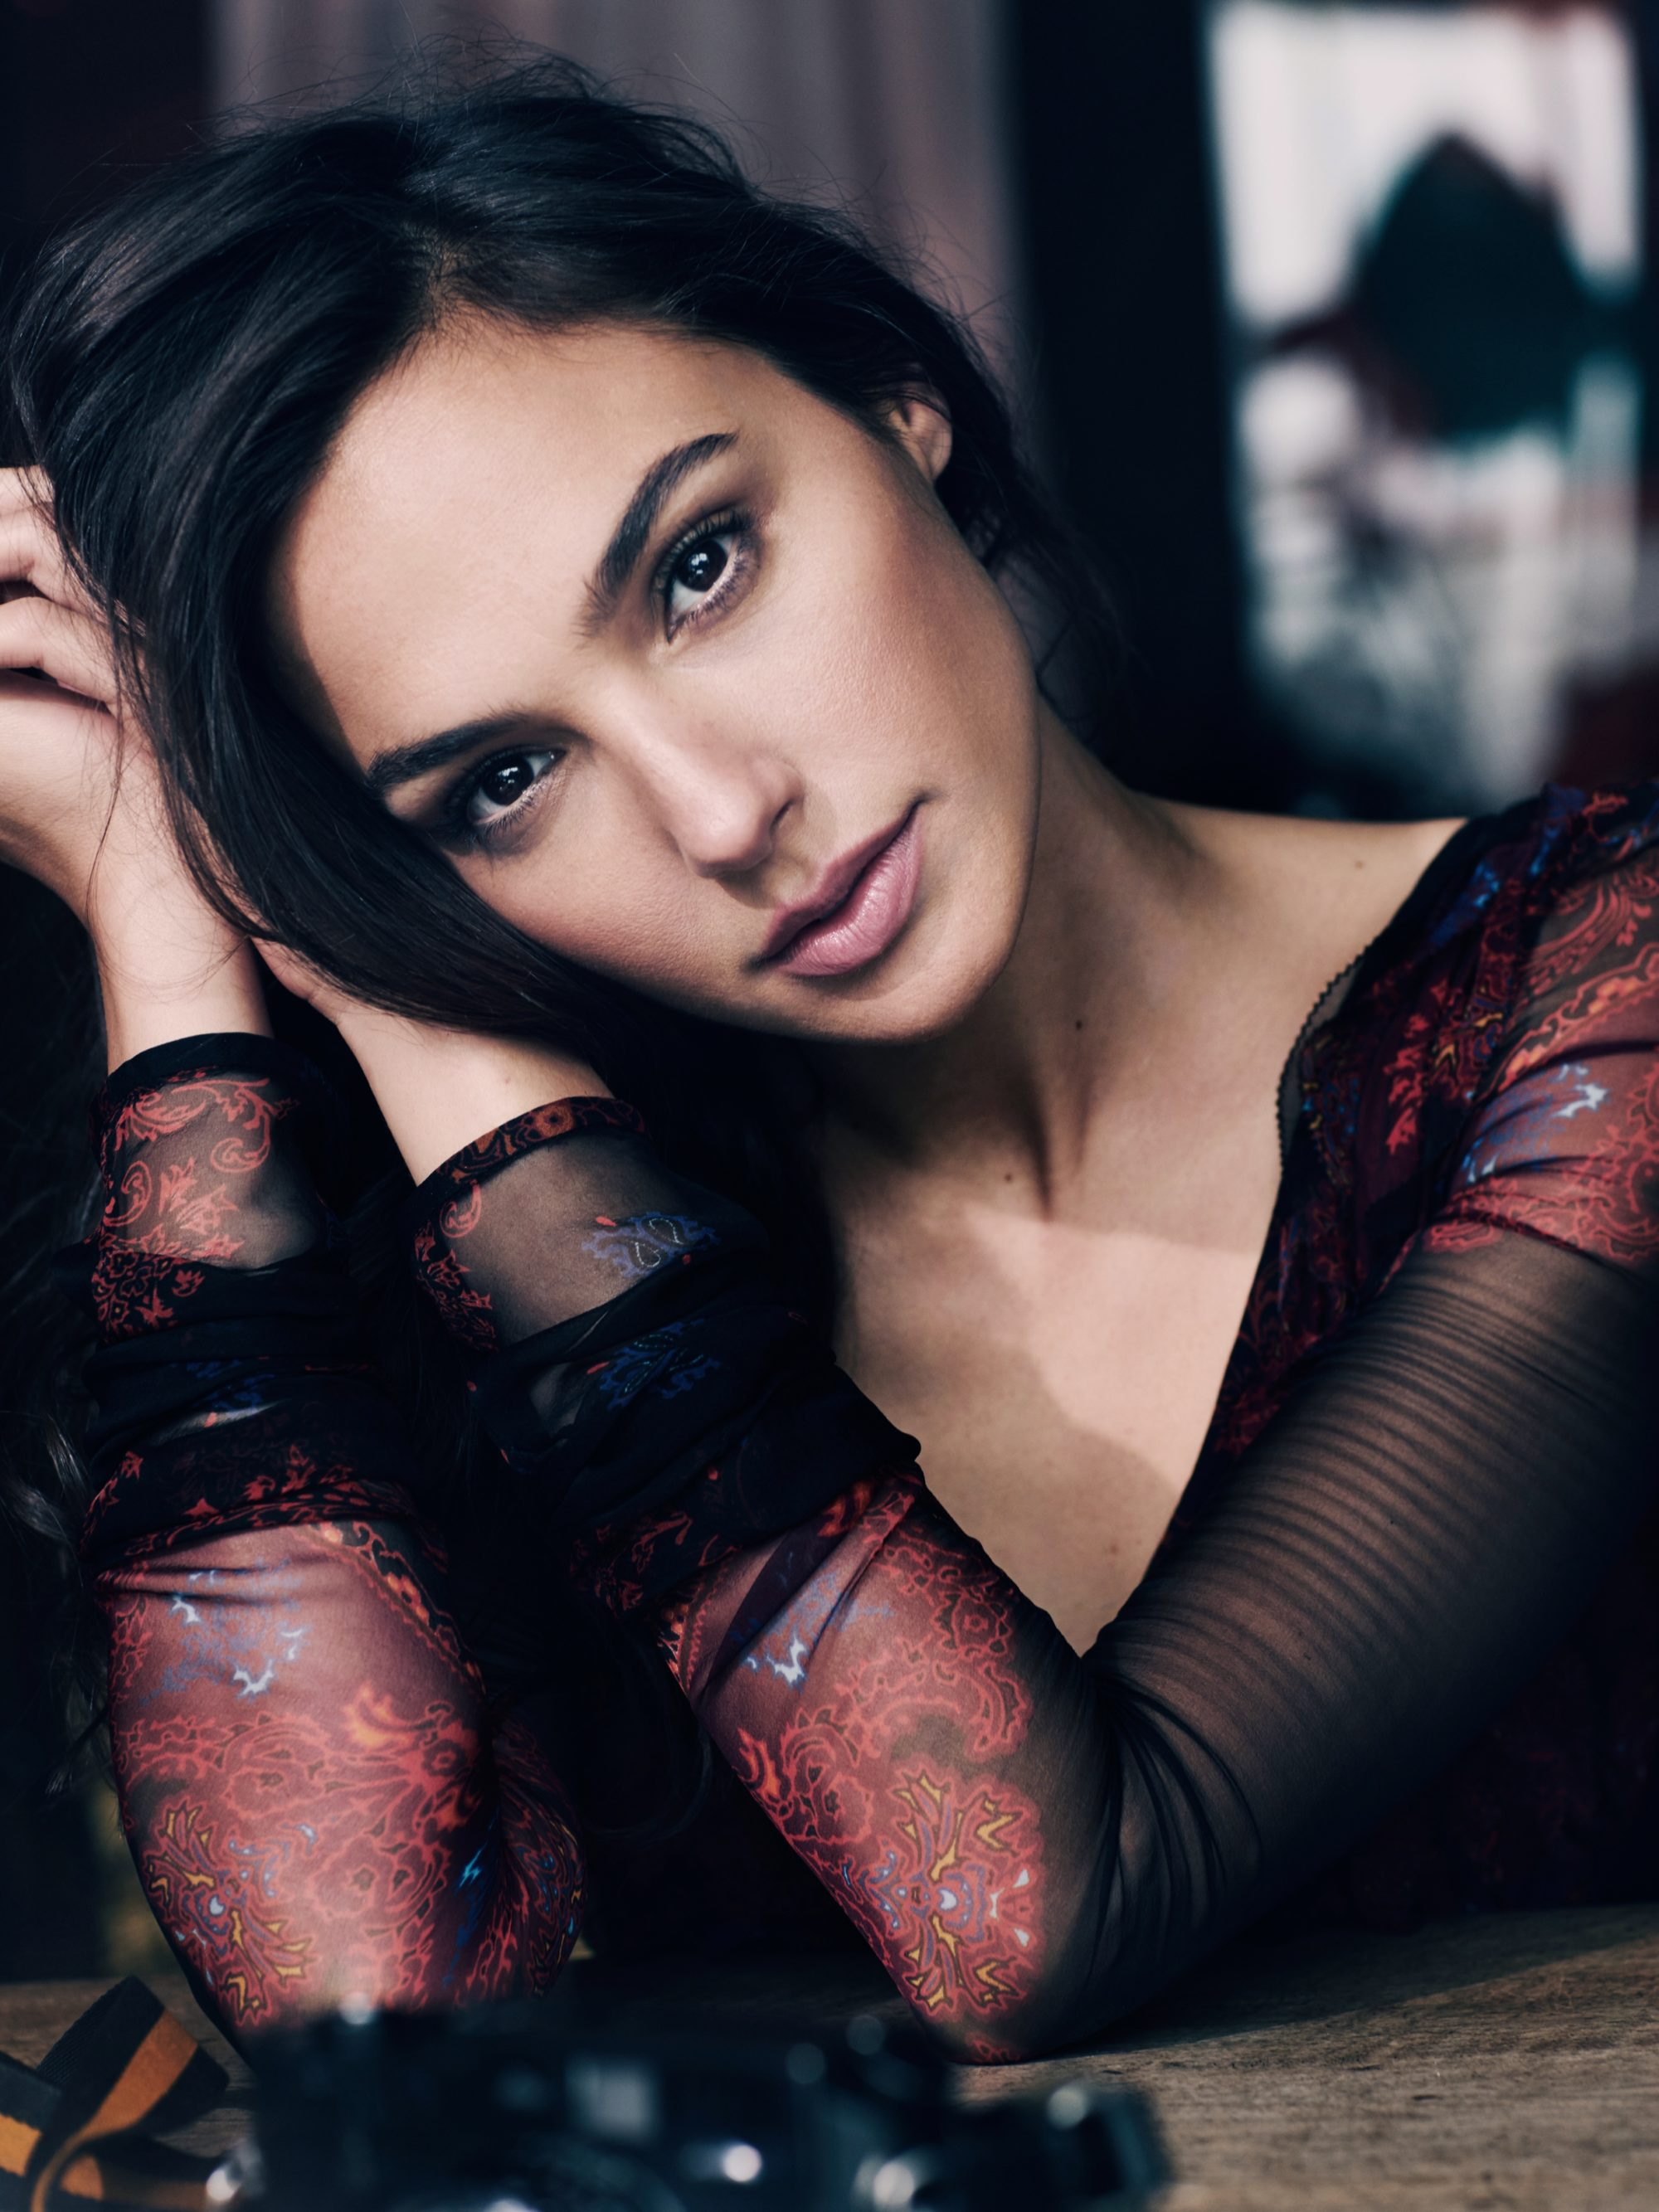 Marian Sell Vogue Russia Gal Gadot 01 A